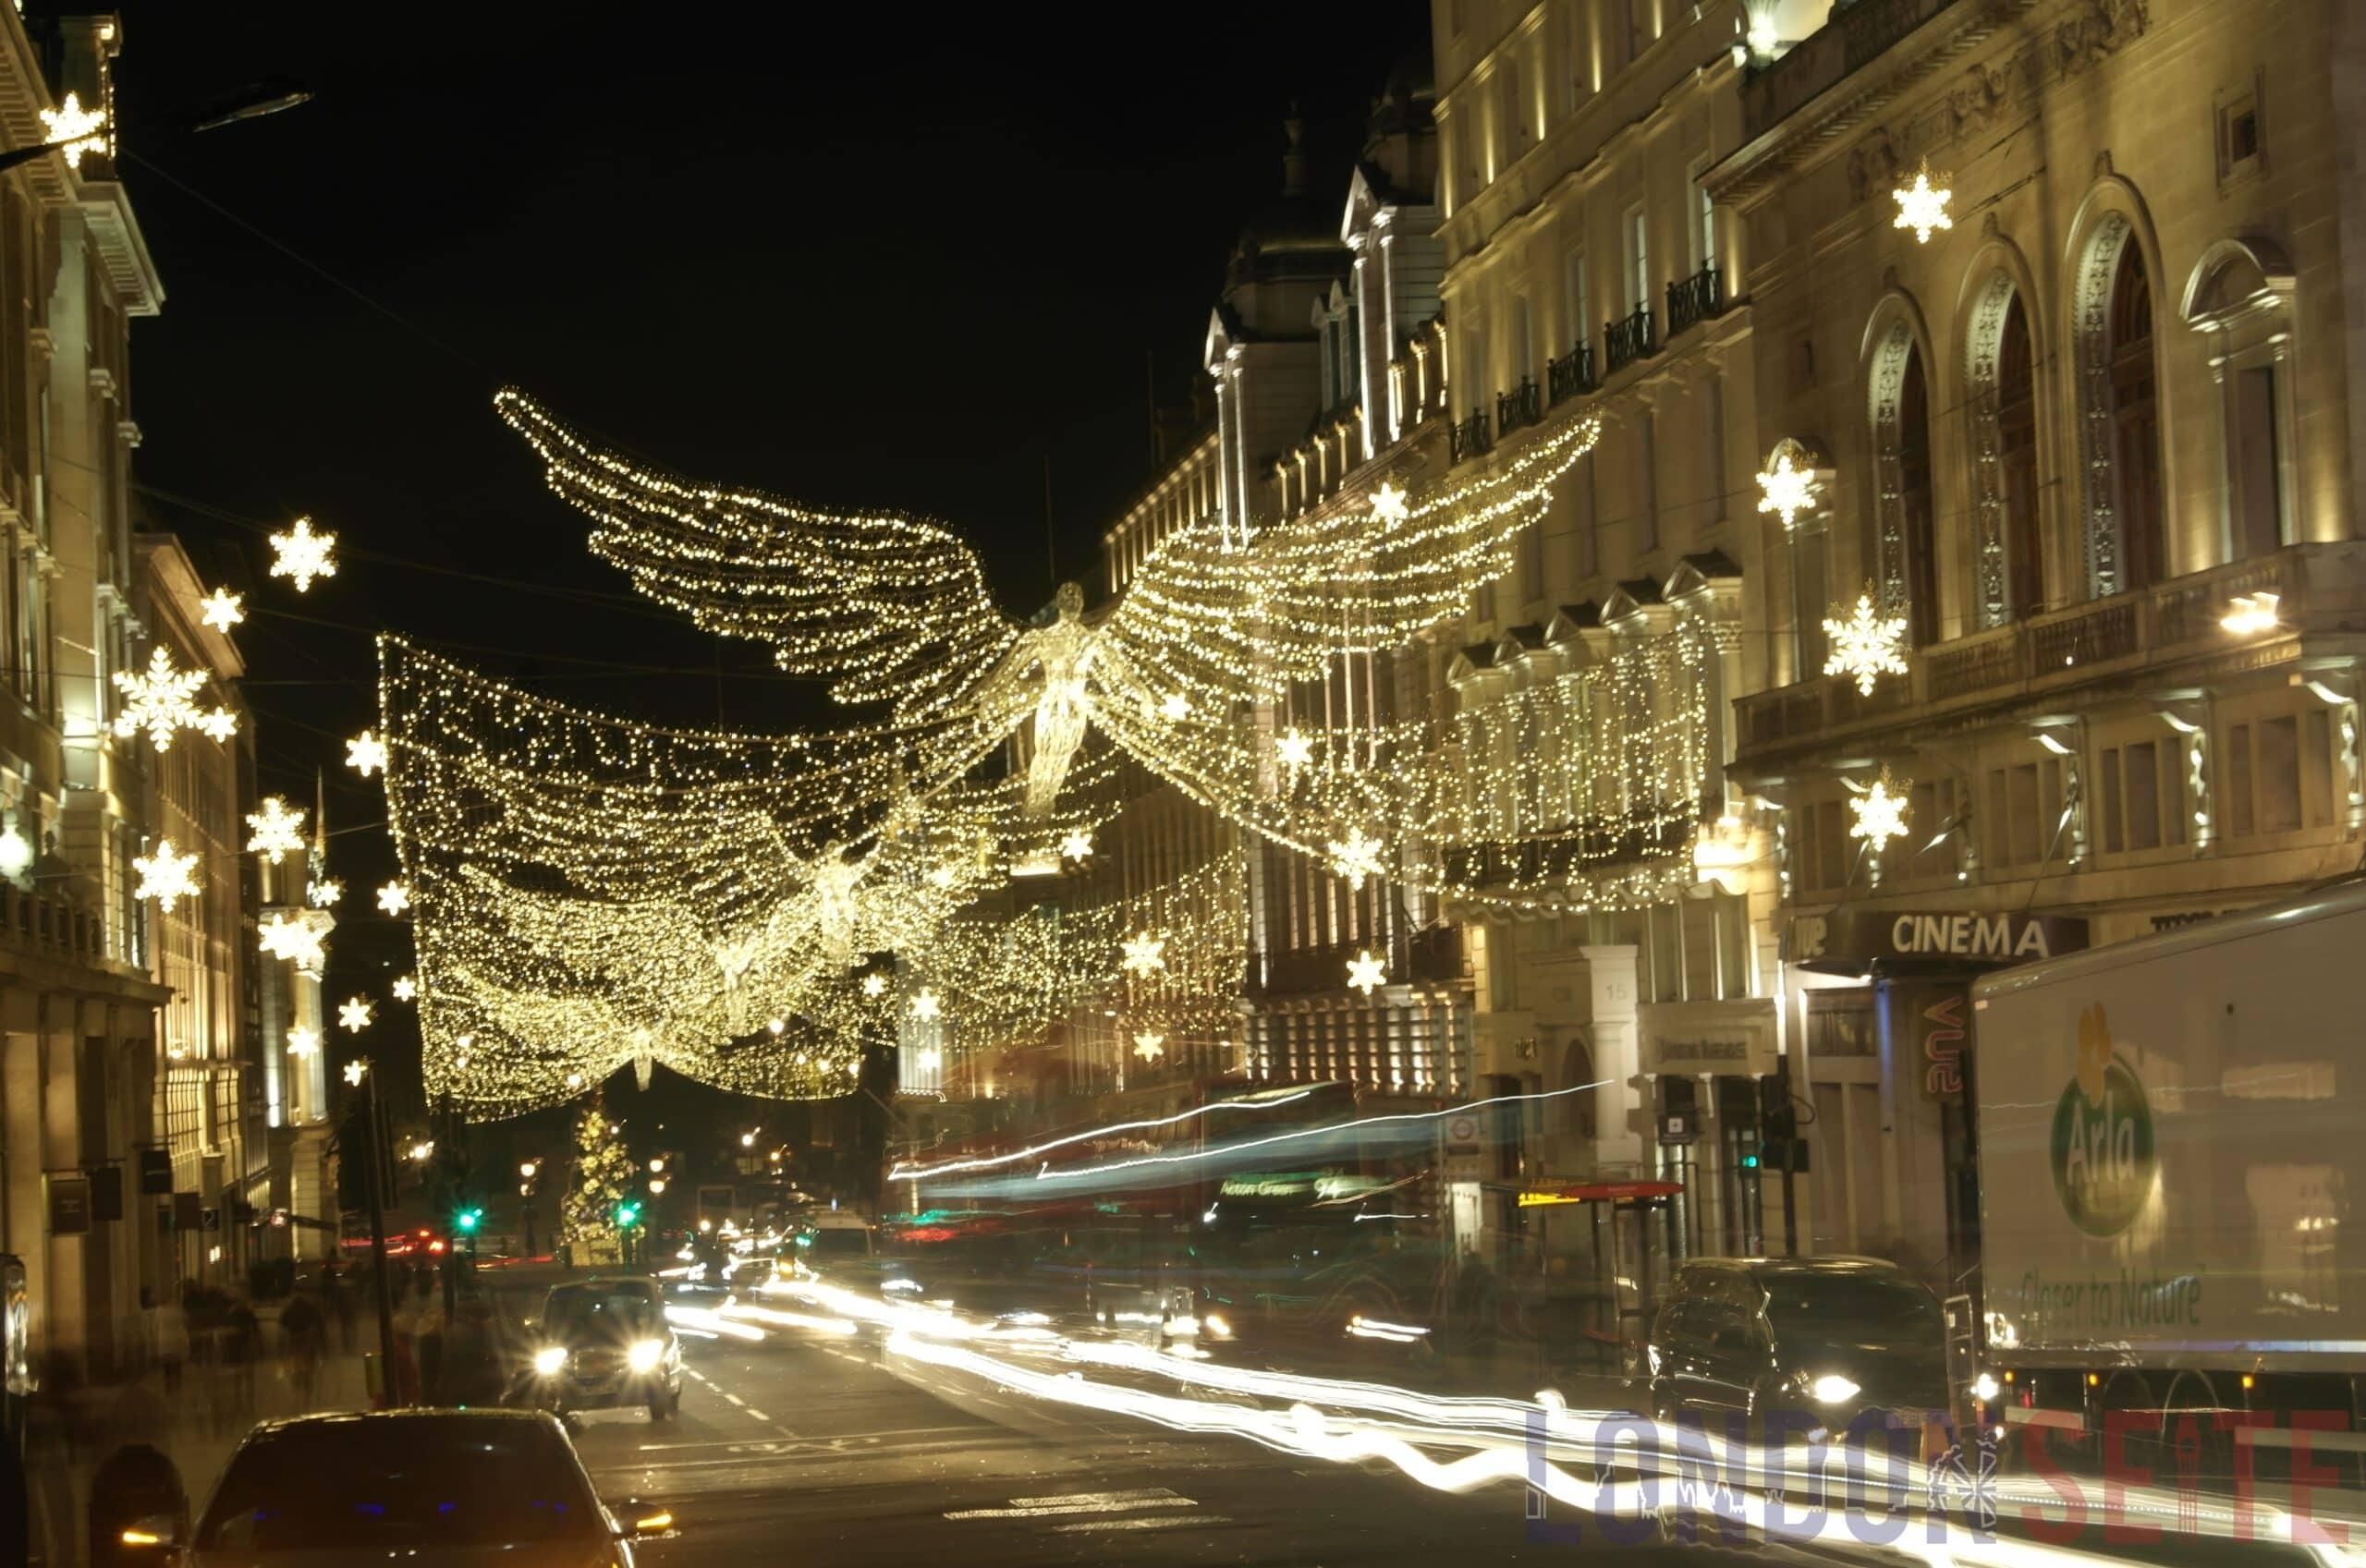 Wann Macht Man Die Weihnachtsbeleuchtung An.Weihnachtsbeleuchtung In London Gehen Die Lichter An Londonseite